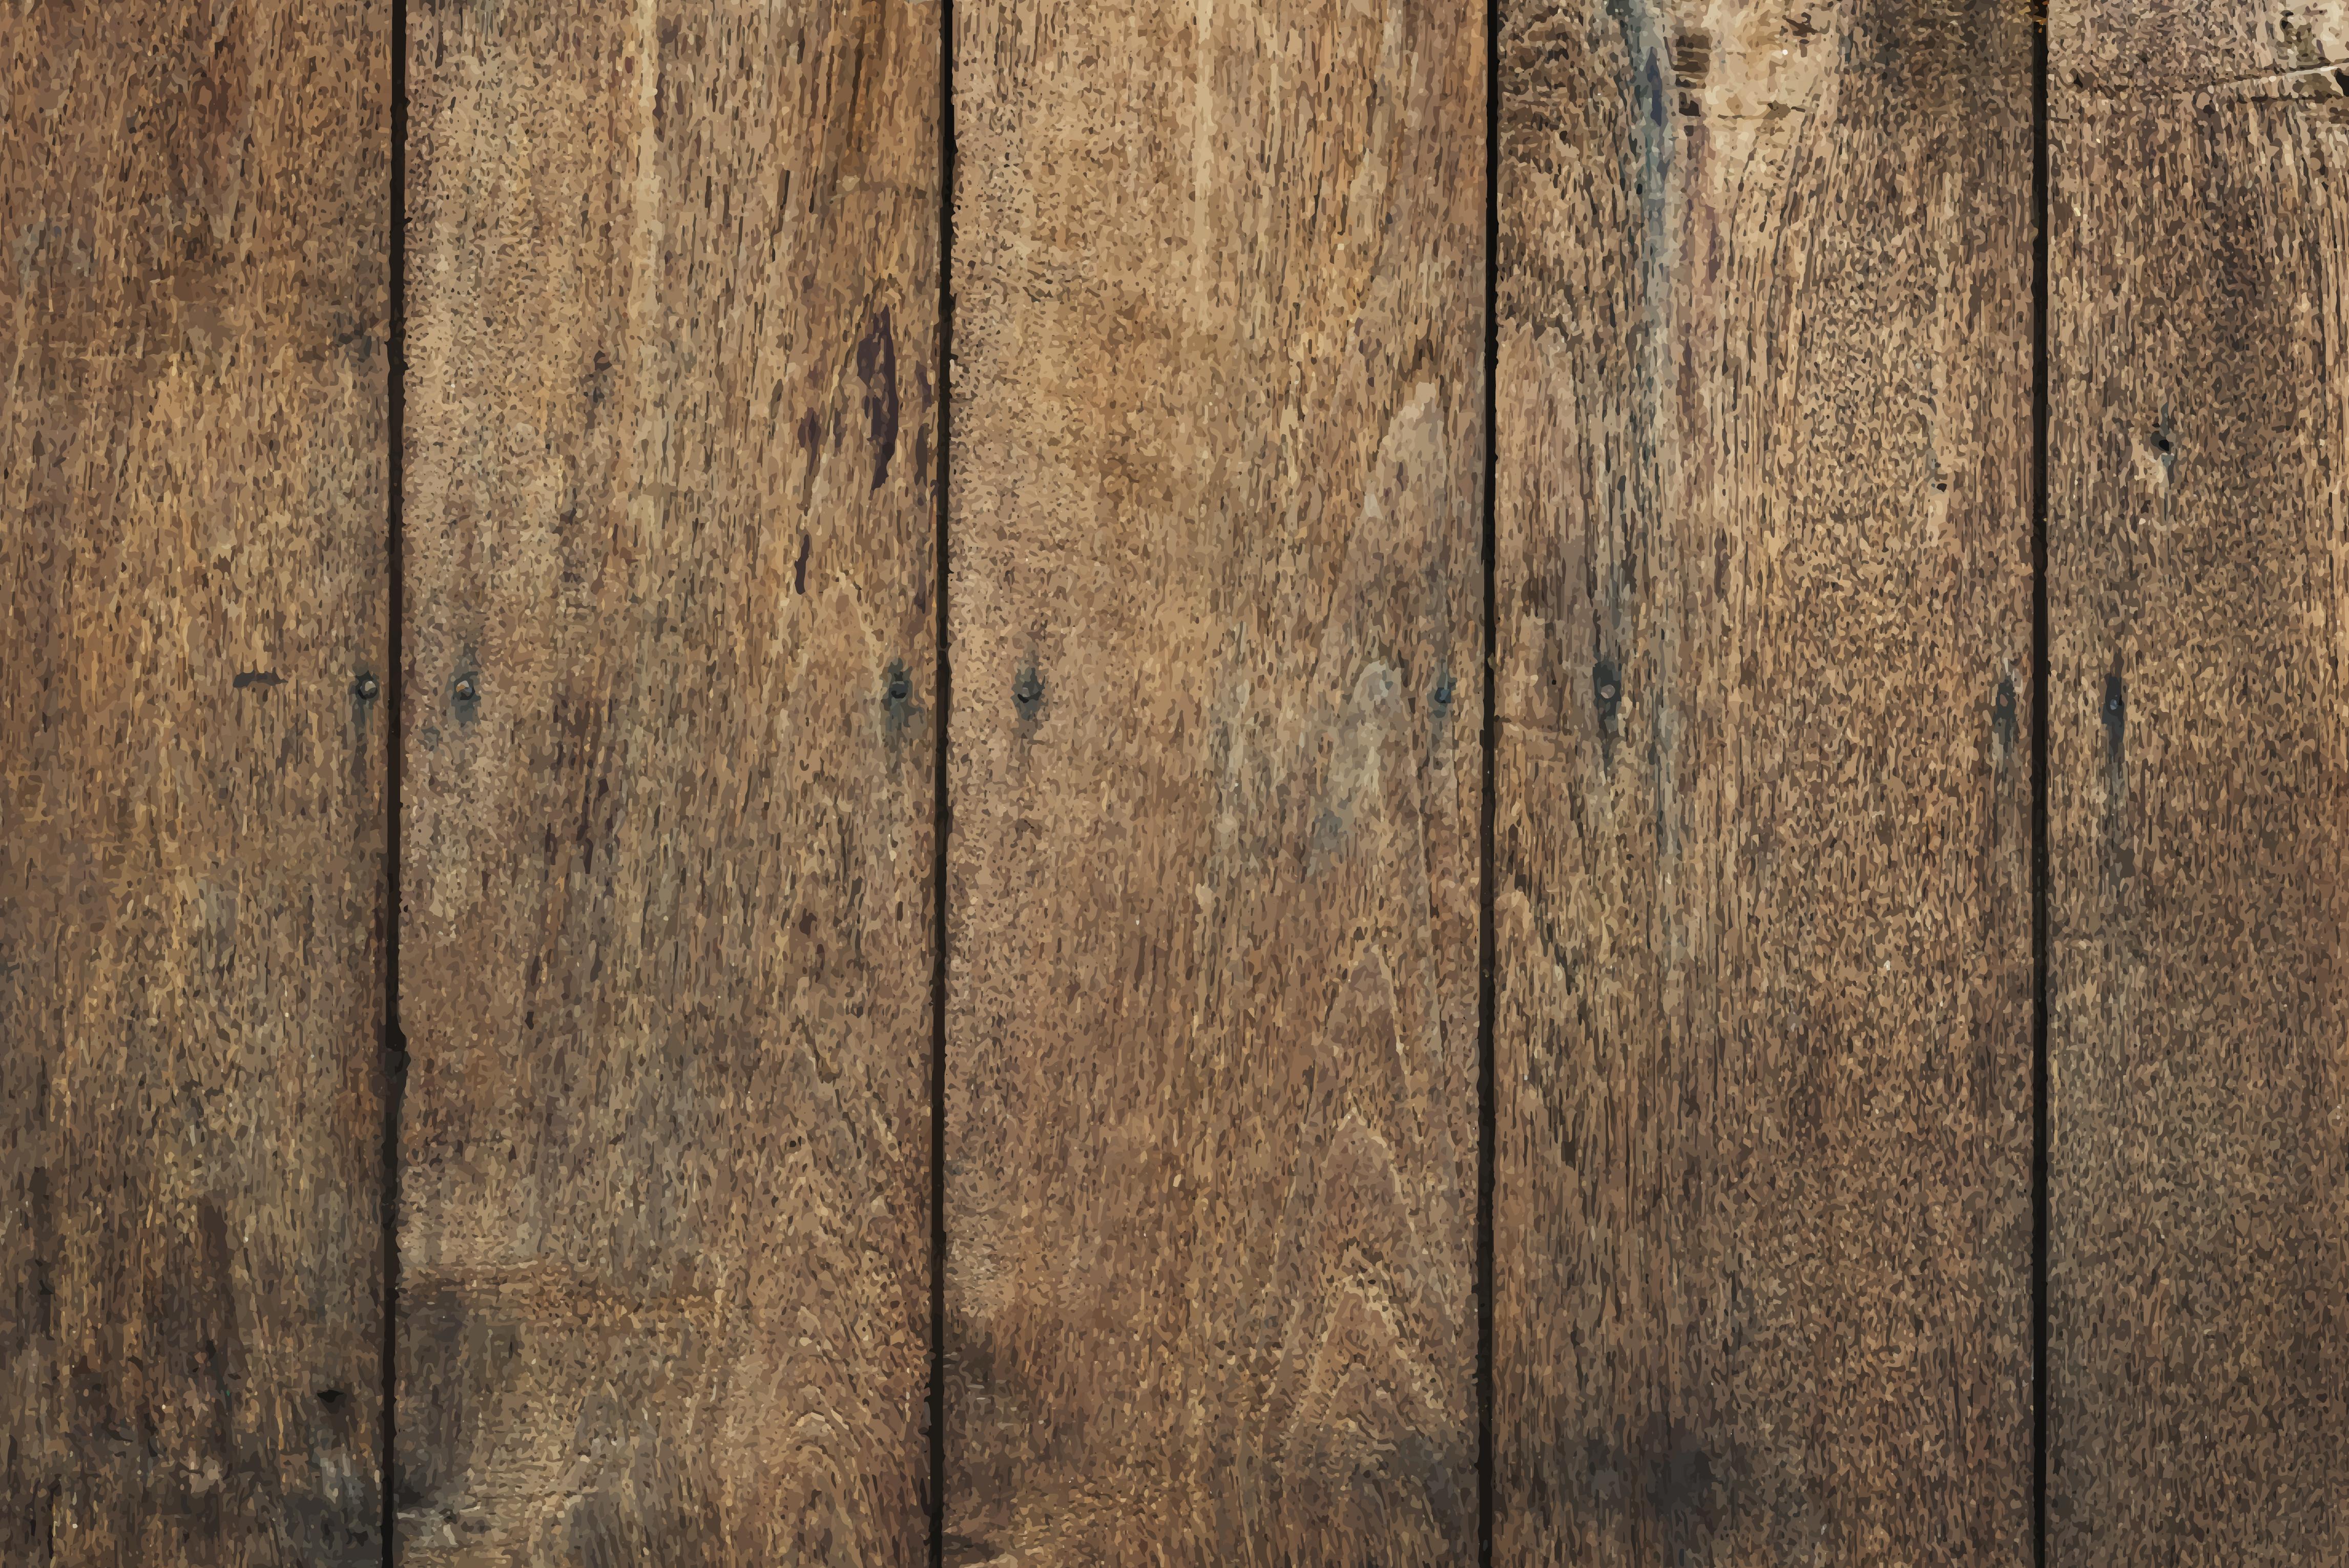 Old Wooden Floor Textured Background Download Free